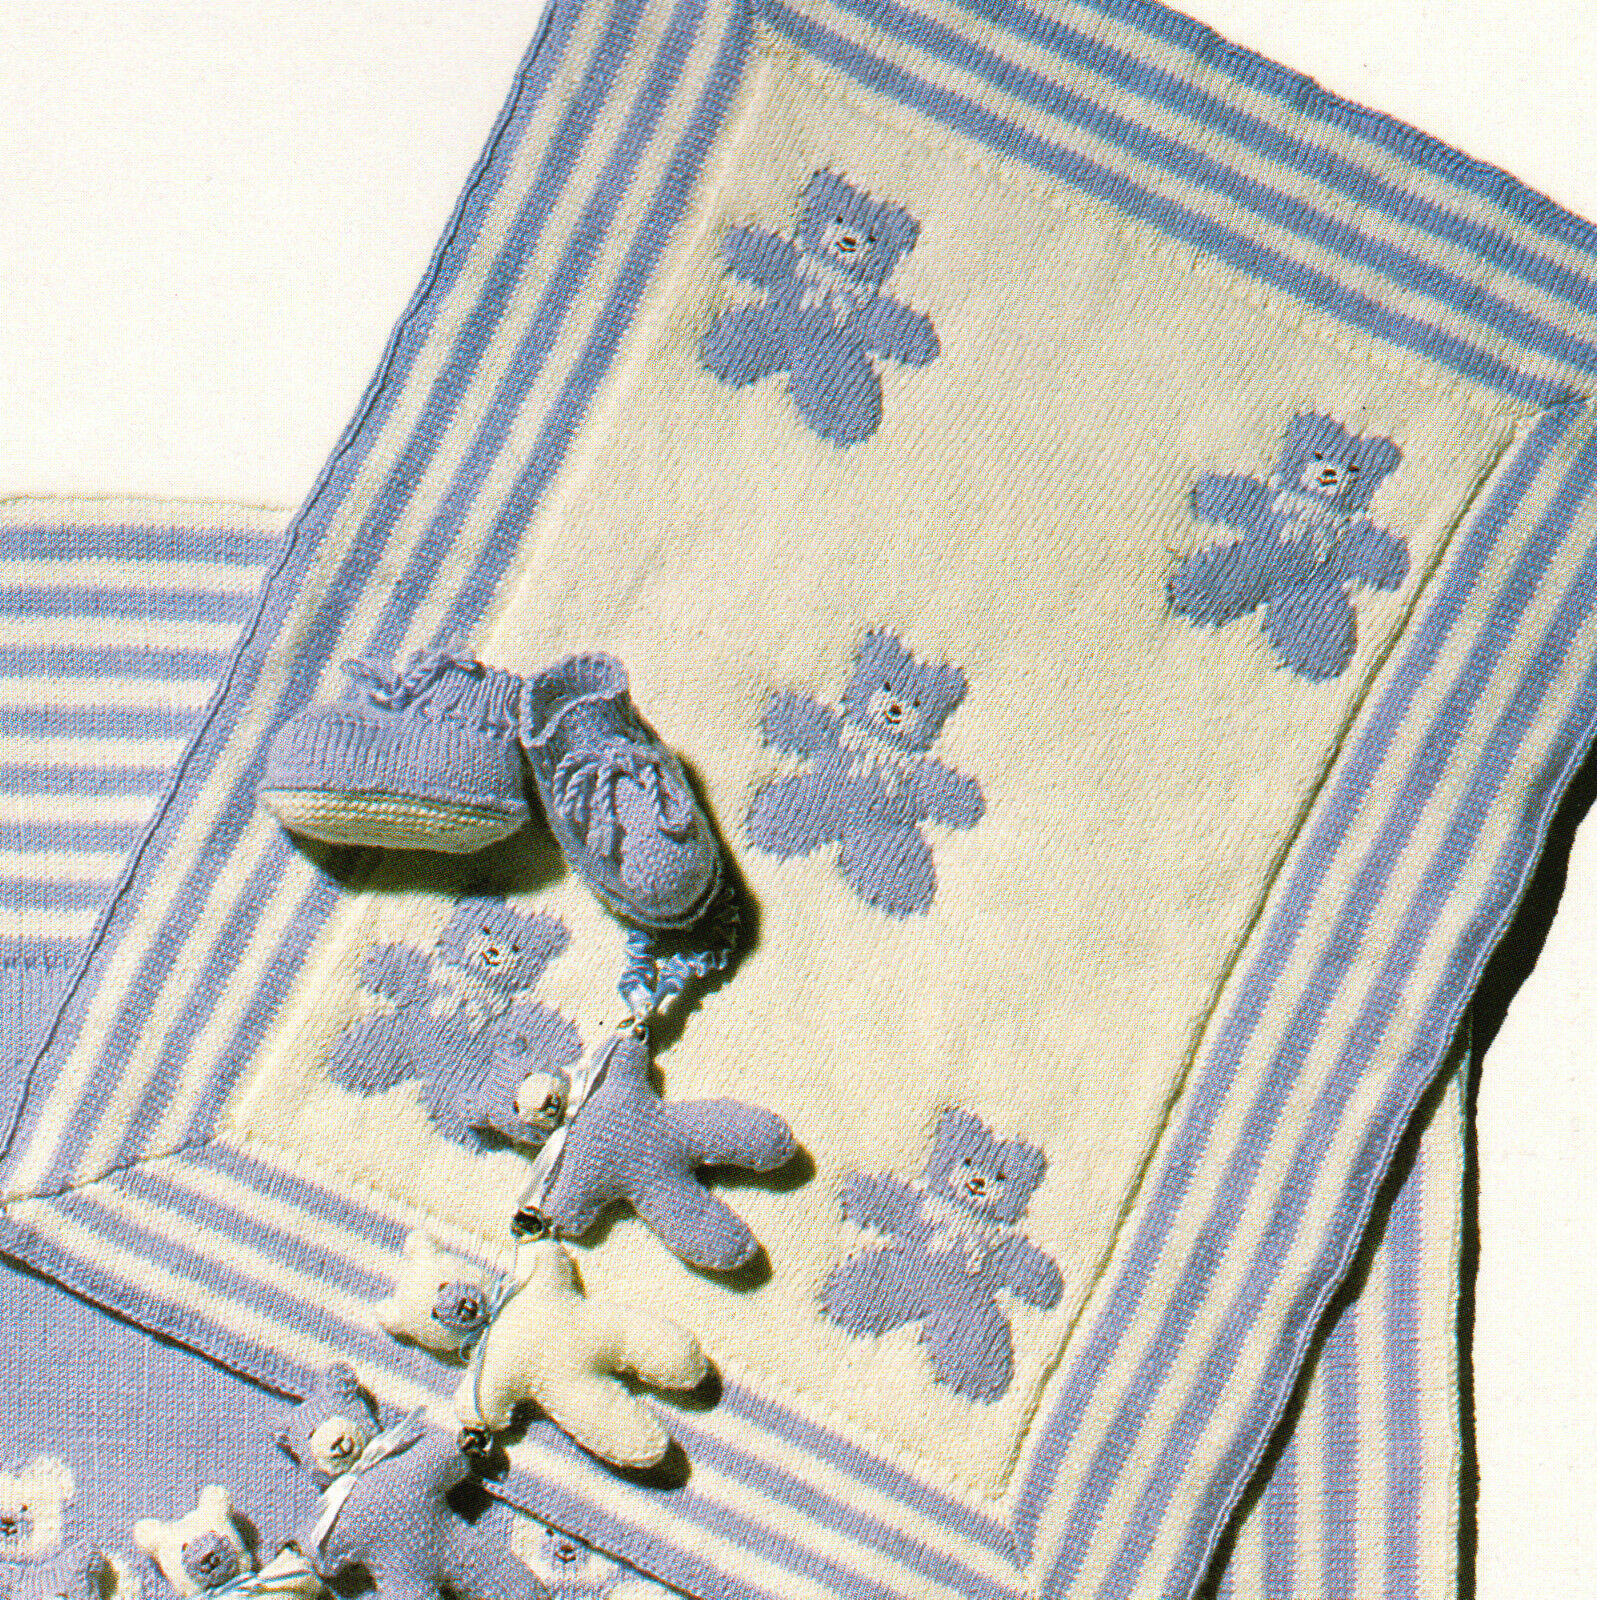 Cute Teddy Bear Baby Blanket & Pram/Cot Cover 4 ply Knitting Pattern ...